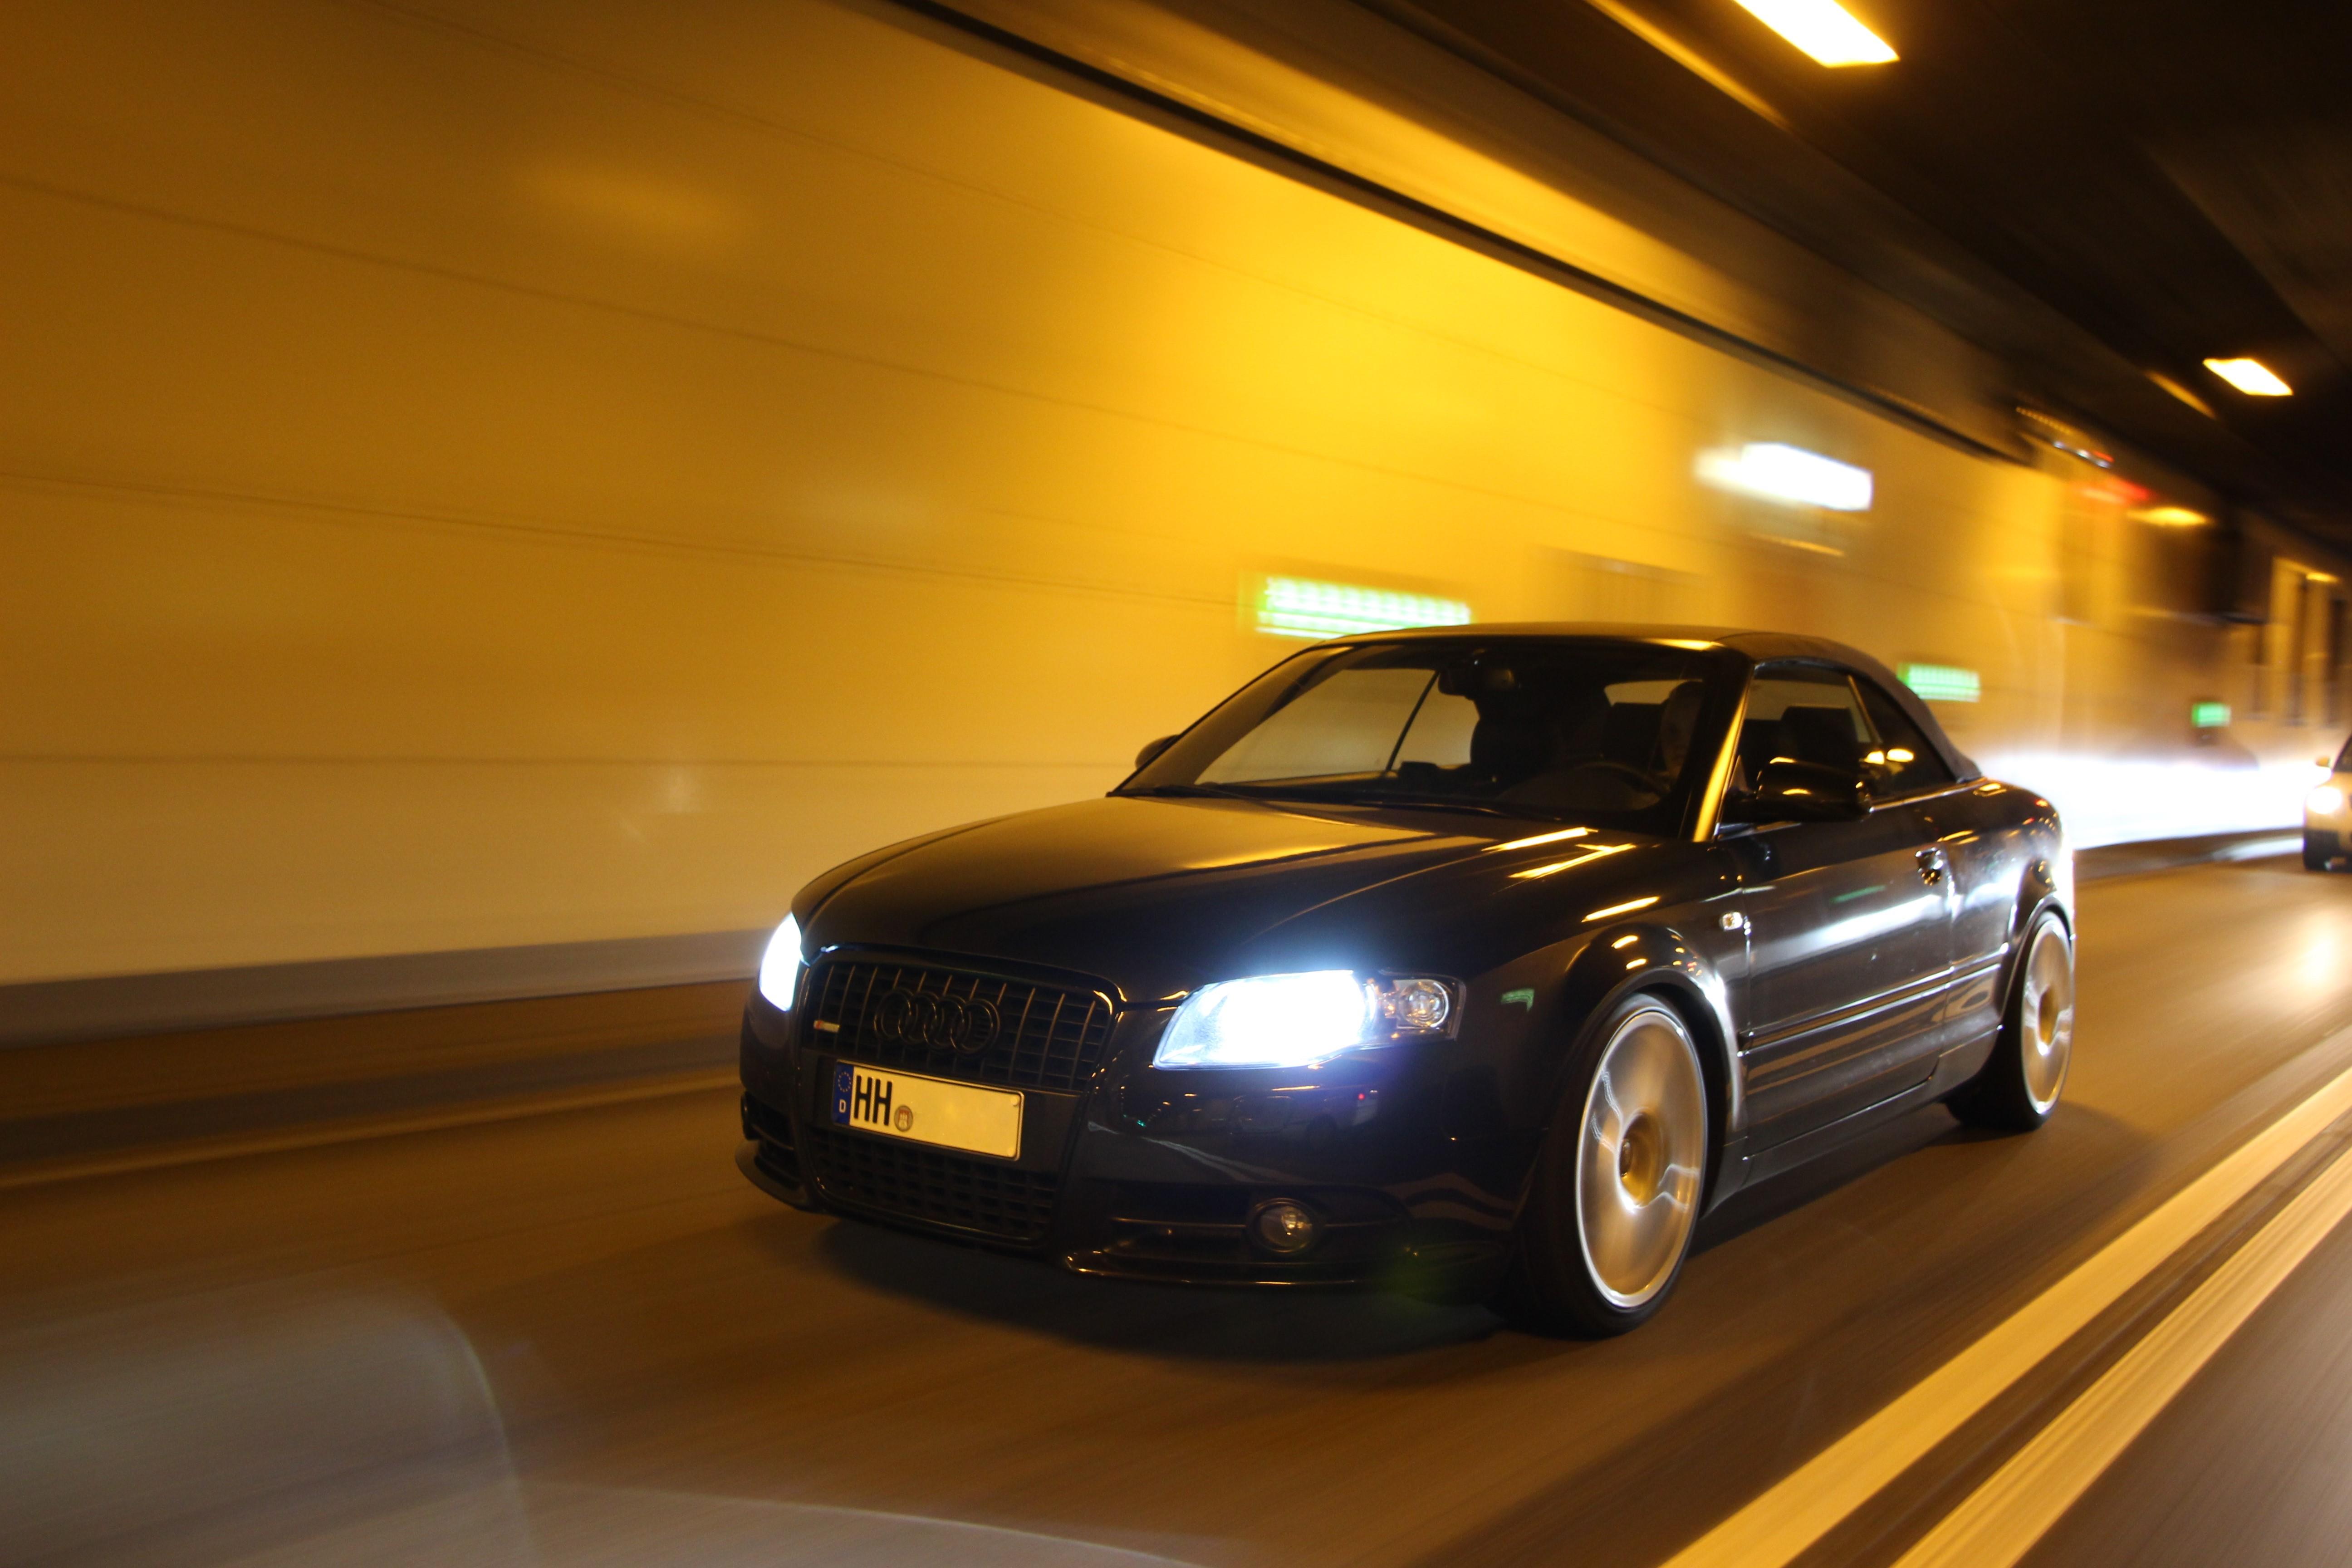 General 5184x3456 Hamburg night car Audi a4 front angle view